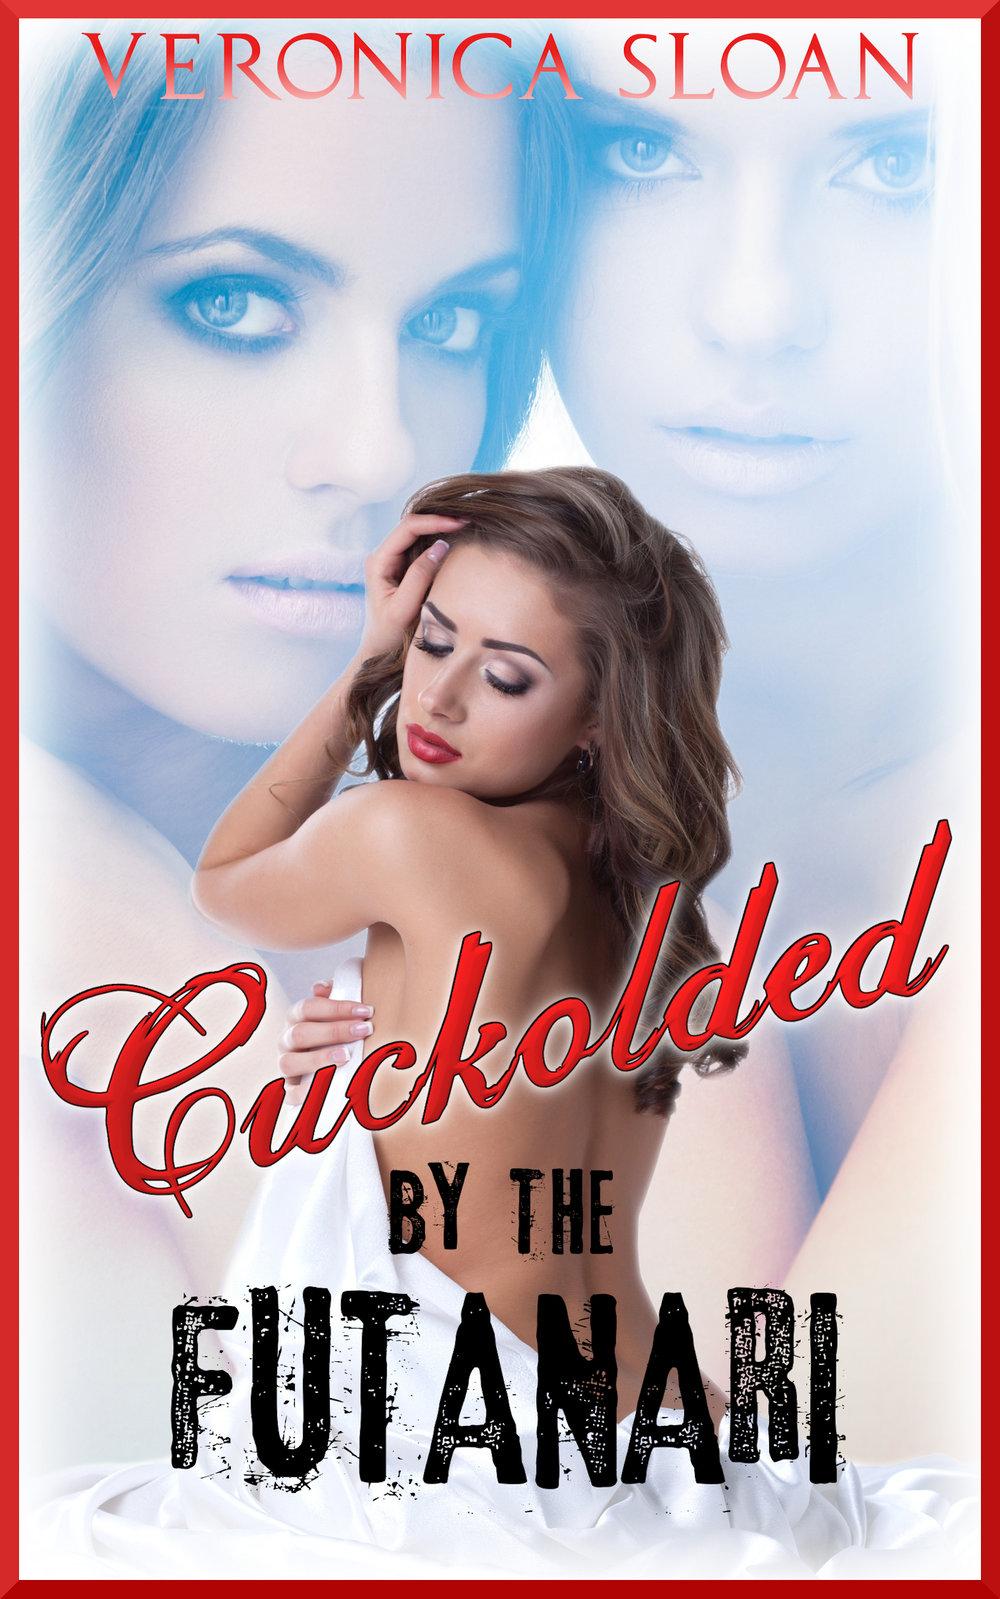 futa-cuckold-cover-3.jpg